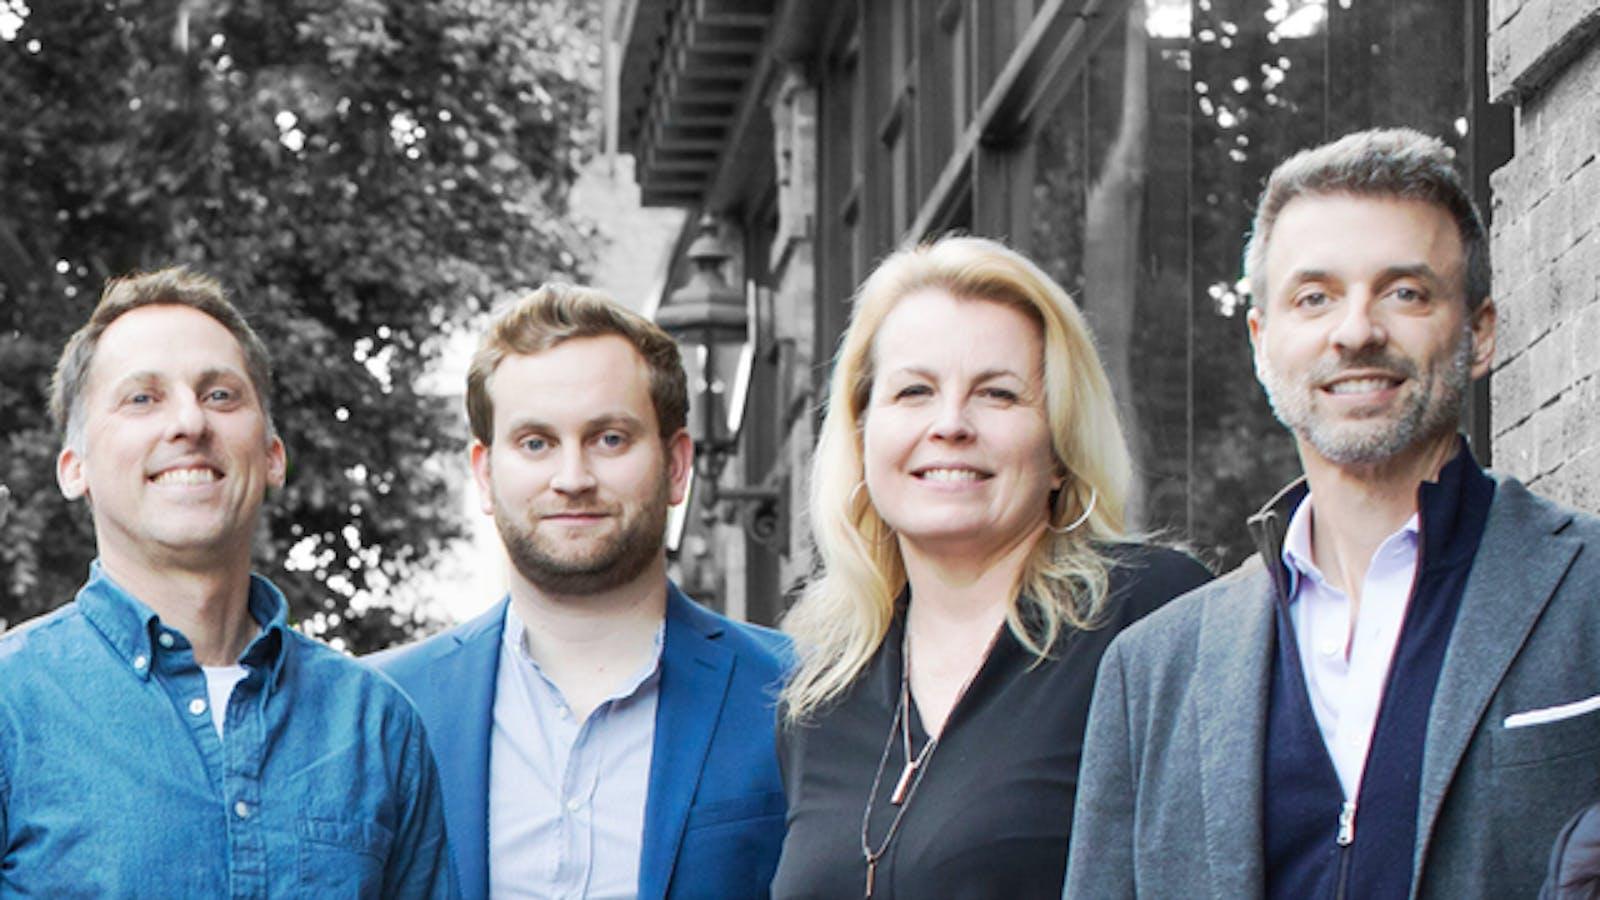 Jyve co-founders James Kairos, Sam Purtill, Cammy Bergren and Brad Oberwager. Photo: Jyve